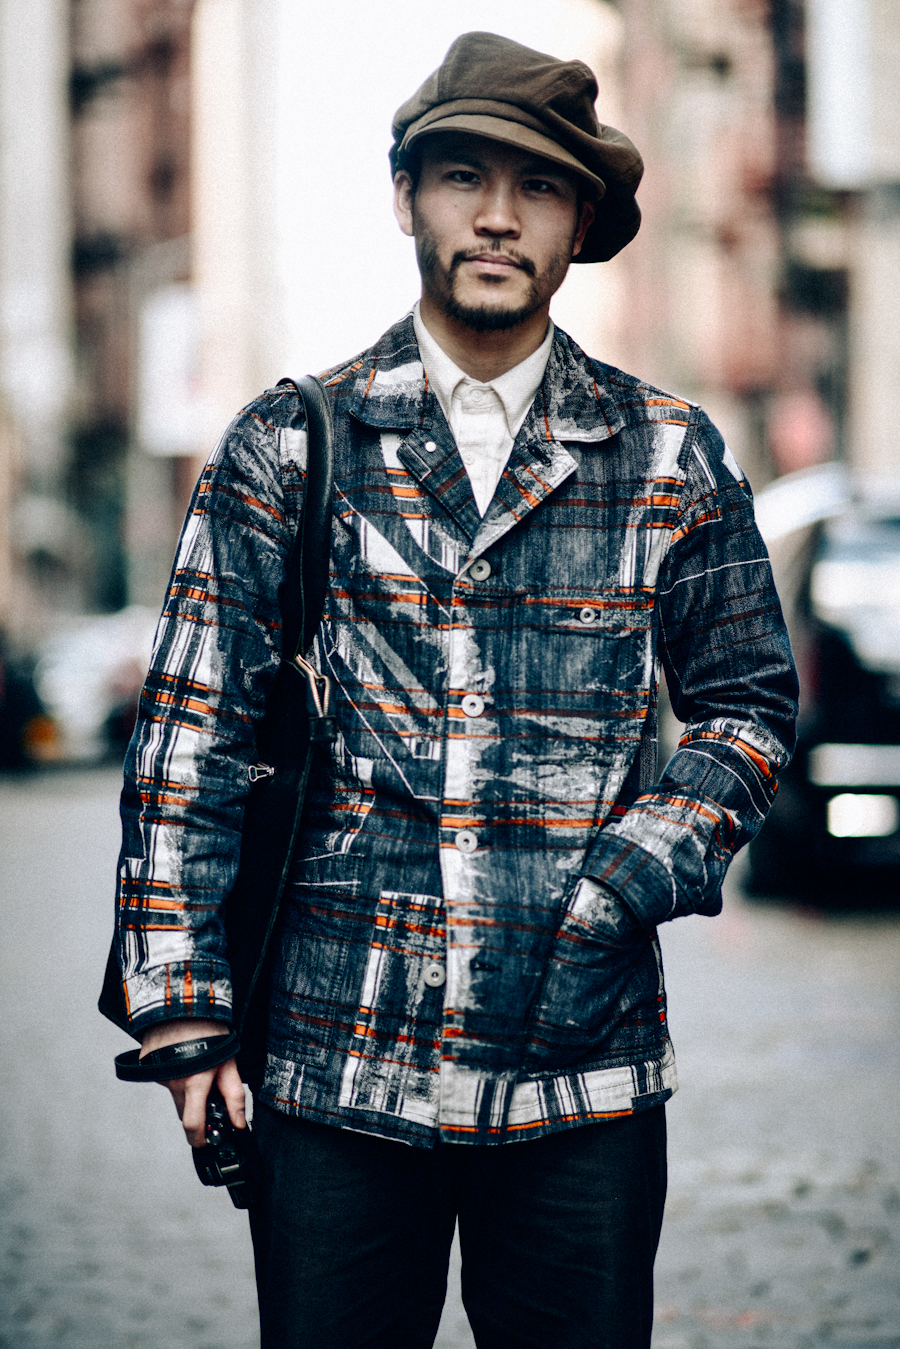 Street-Gents-RYO MIYAMOTO-Crosby-Street-New-York.jpg